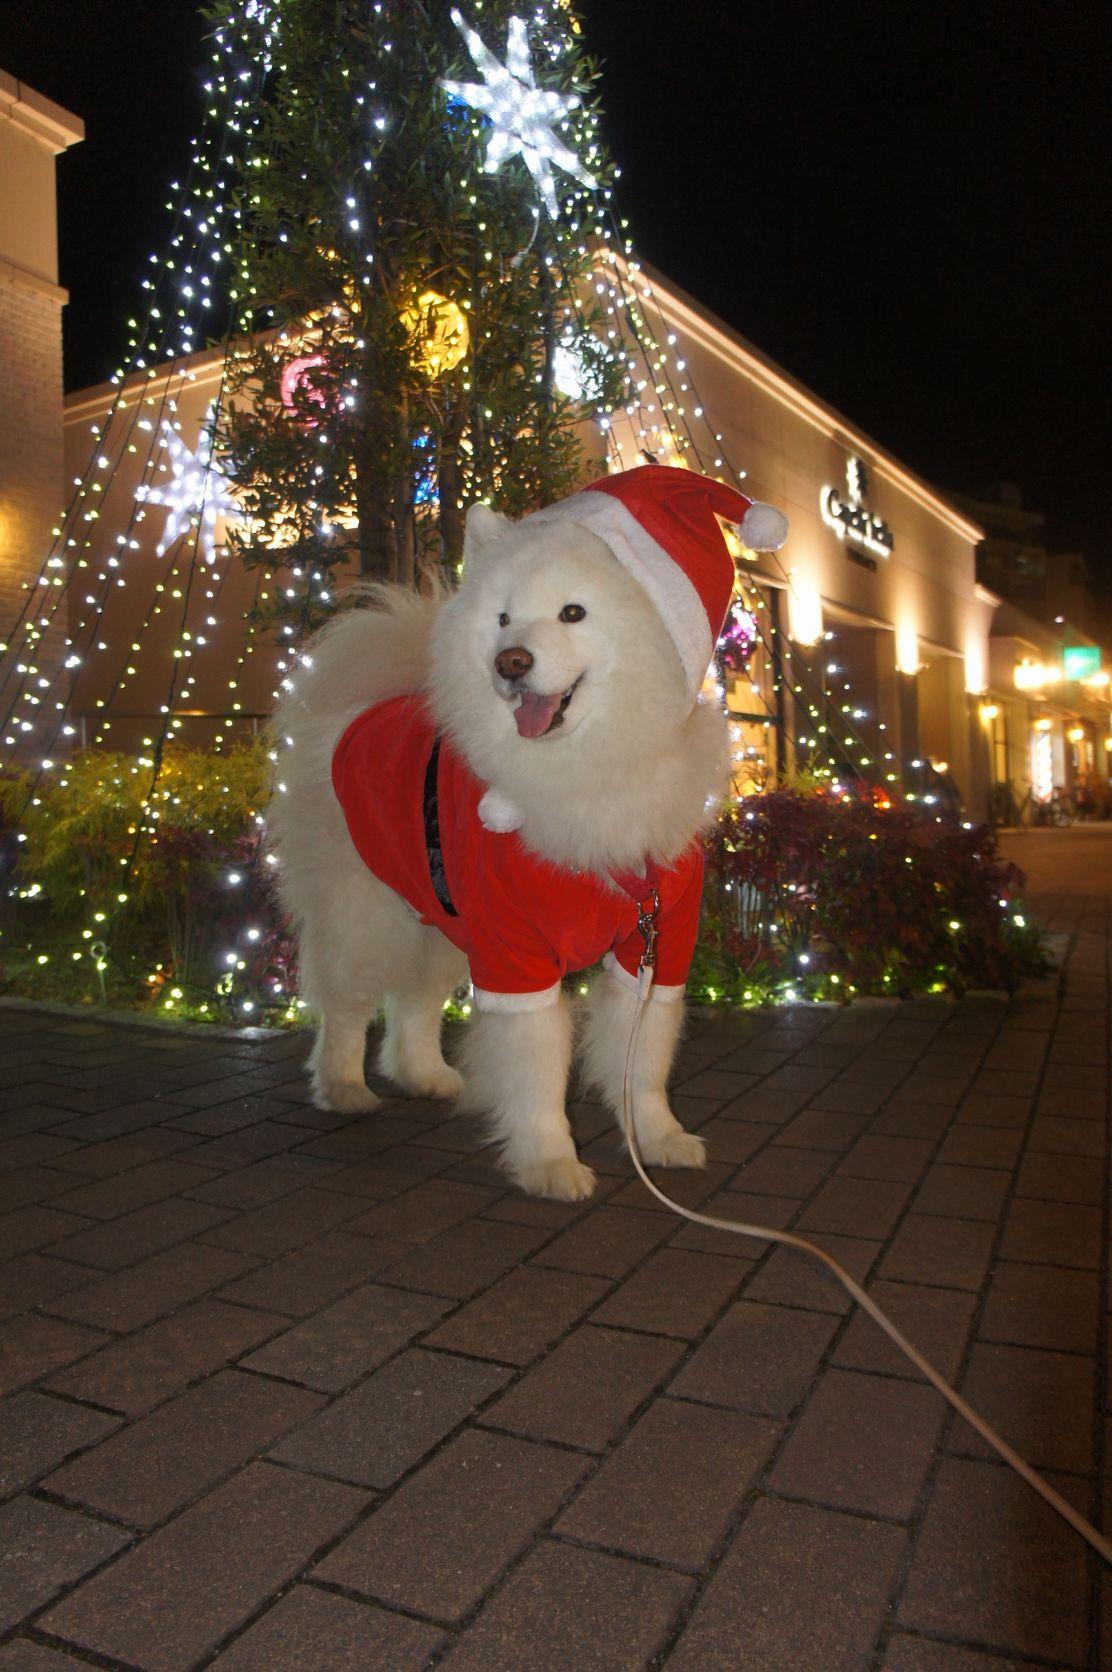 Merry Christmas_f0128542_032345.jpg